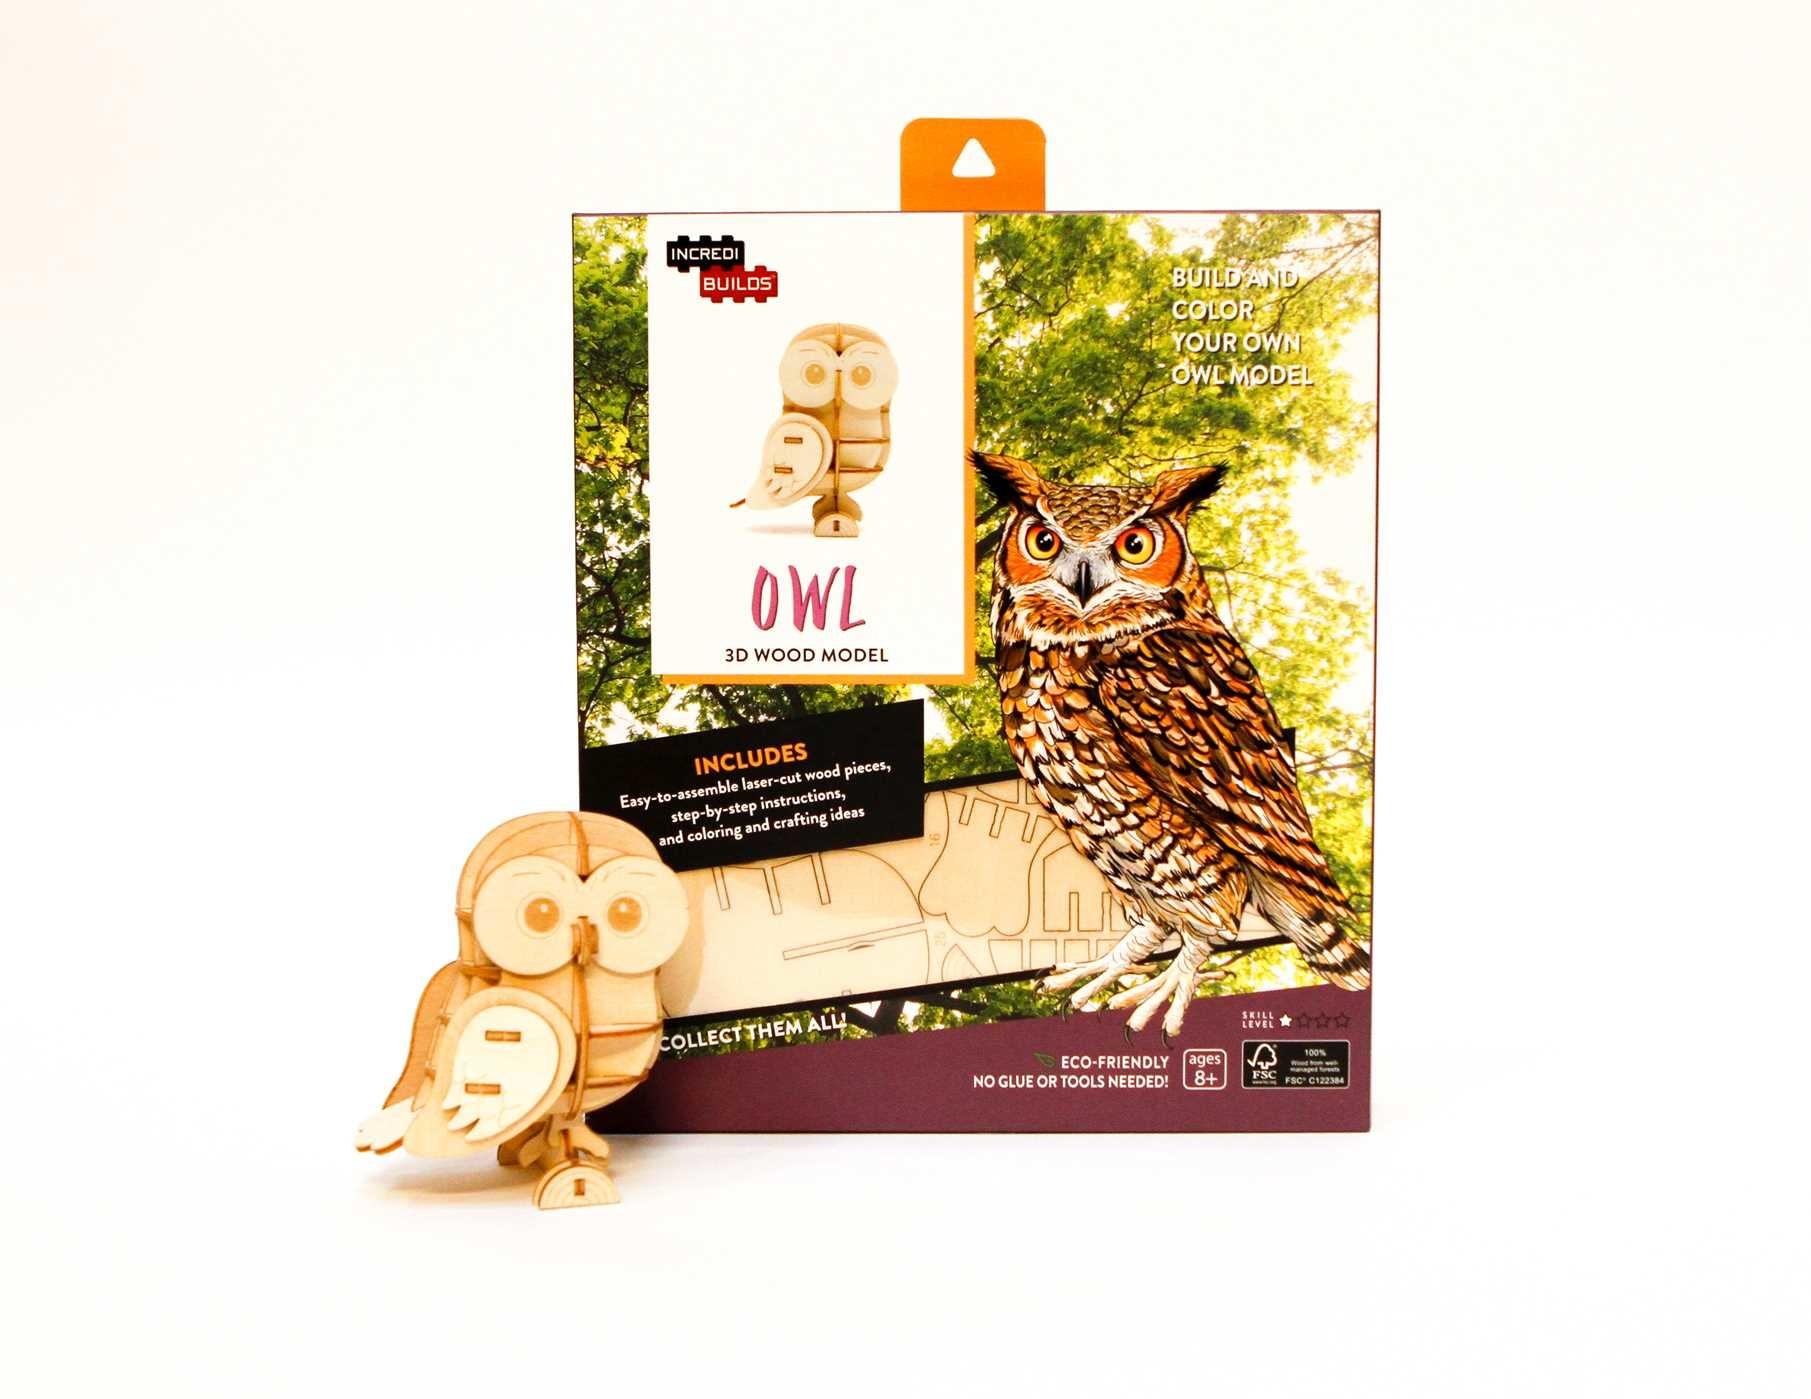 Incredibuilds owl 3d wood model 9781682980408.in04